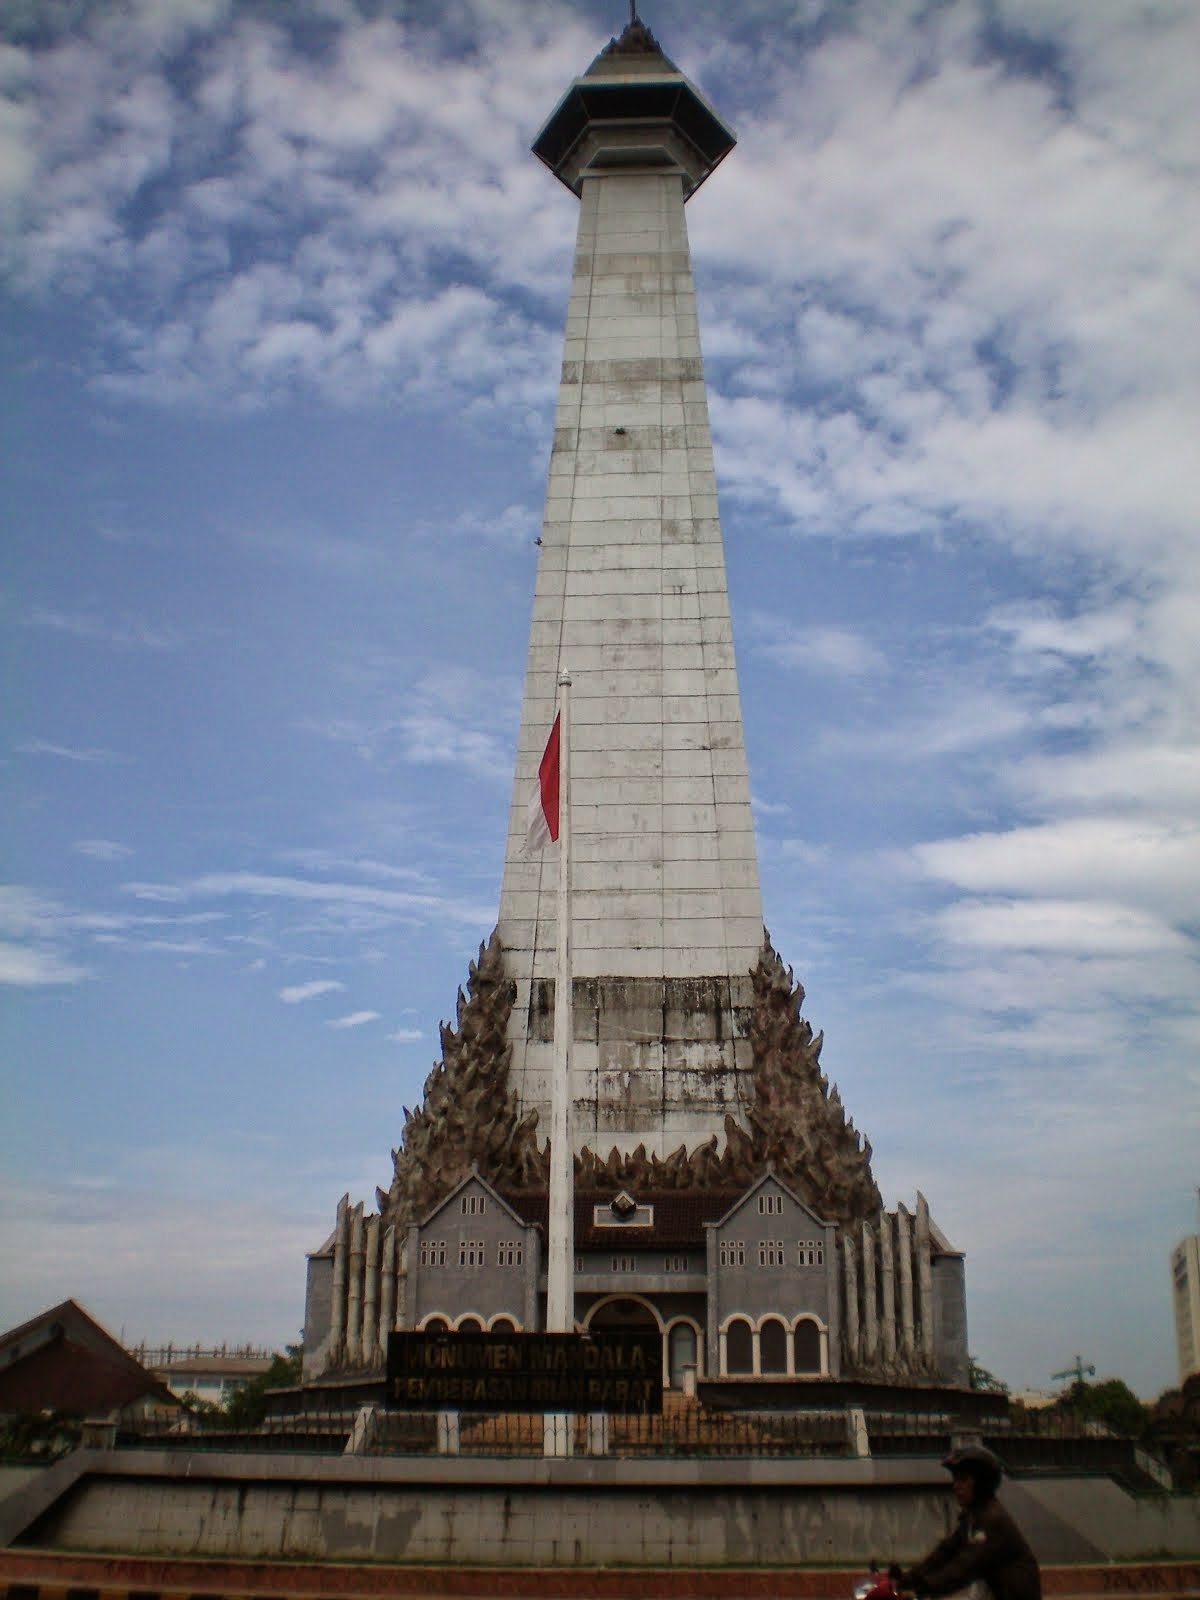 Monumen Mandala Bukti Monumental Pembebasan Irian Barat Makassar Kota